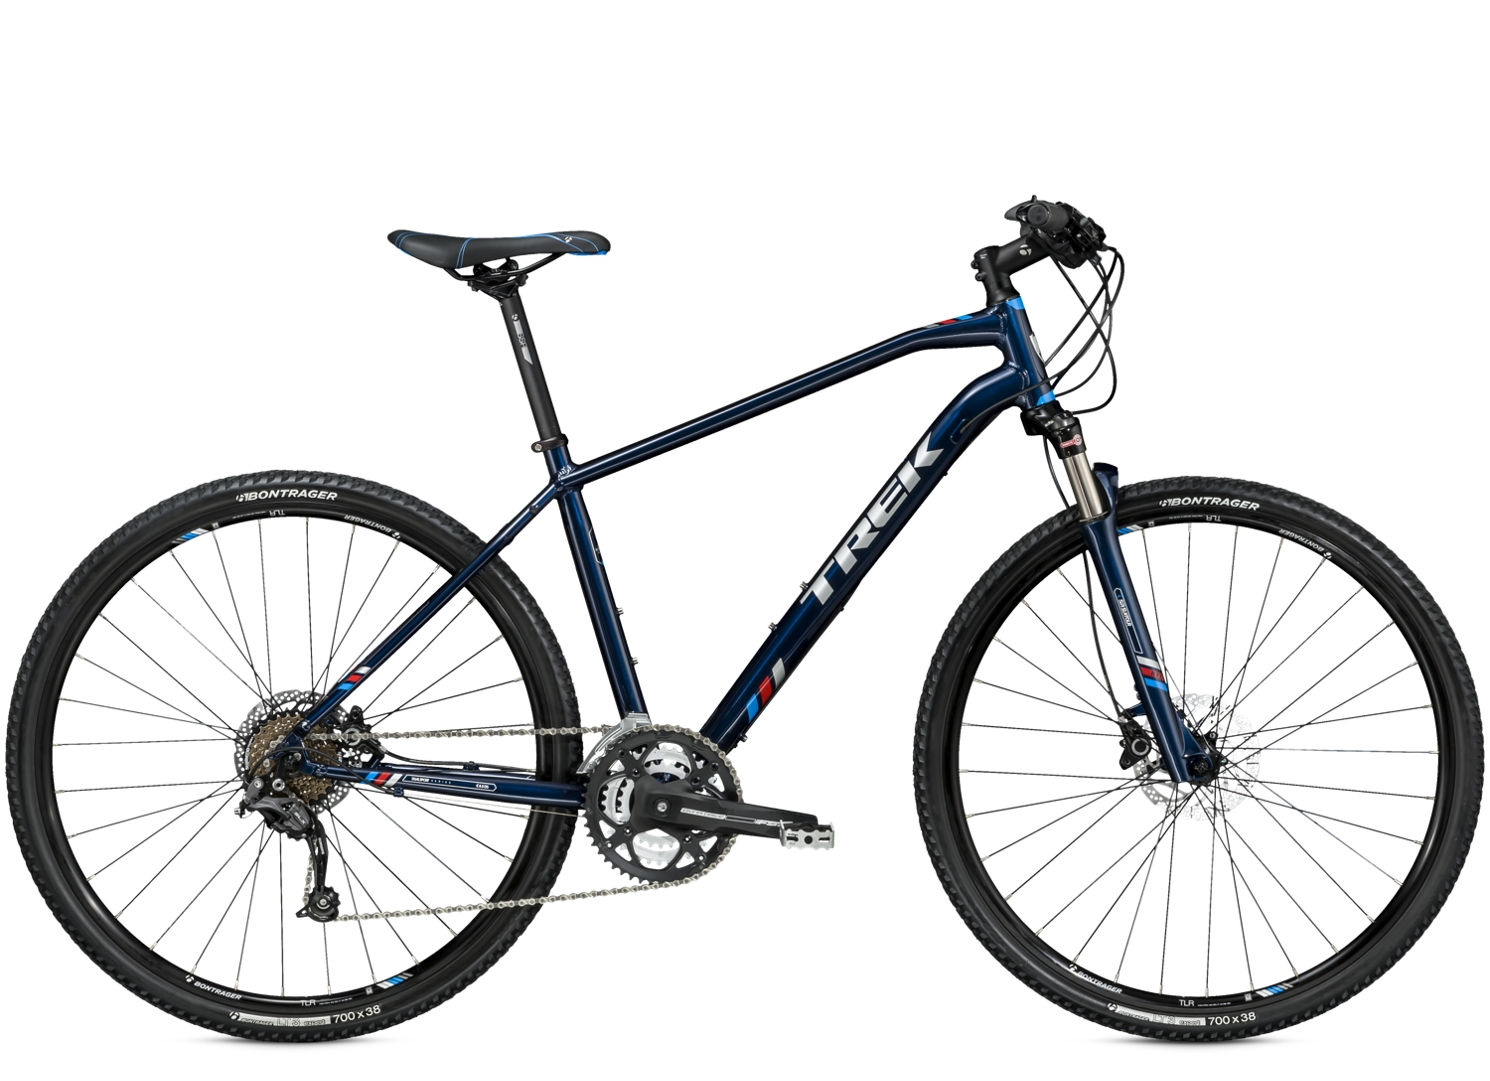 8 5 Ds Trek Bicycle